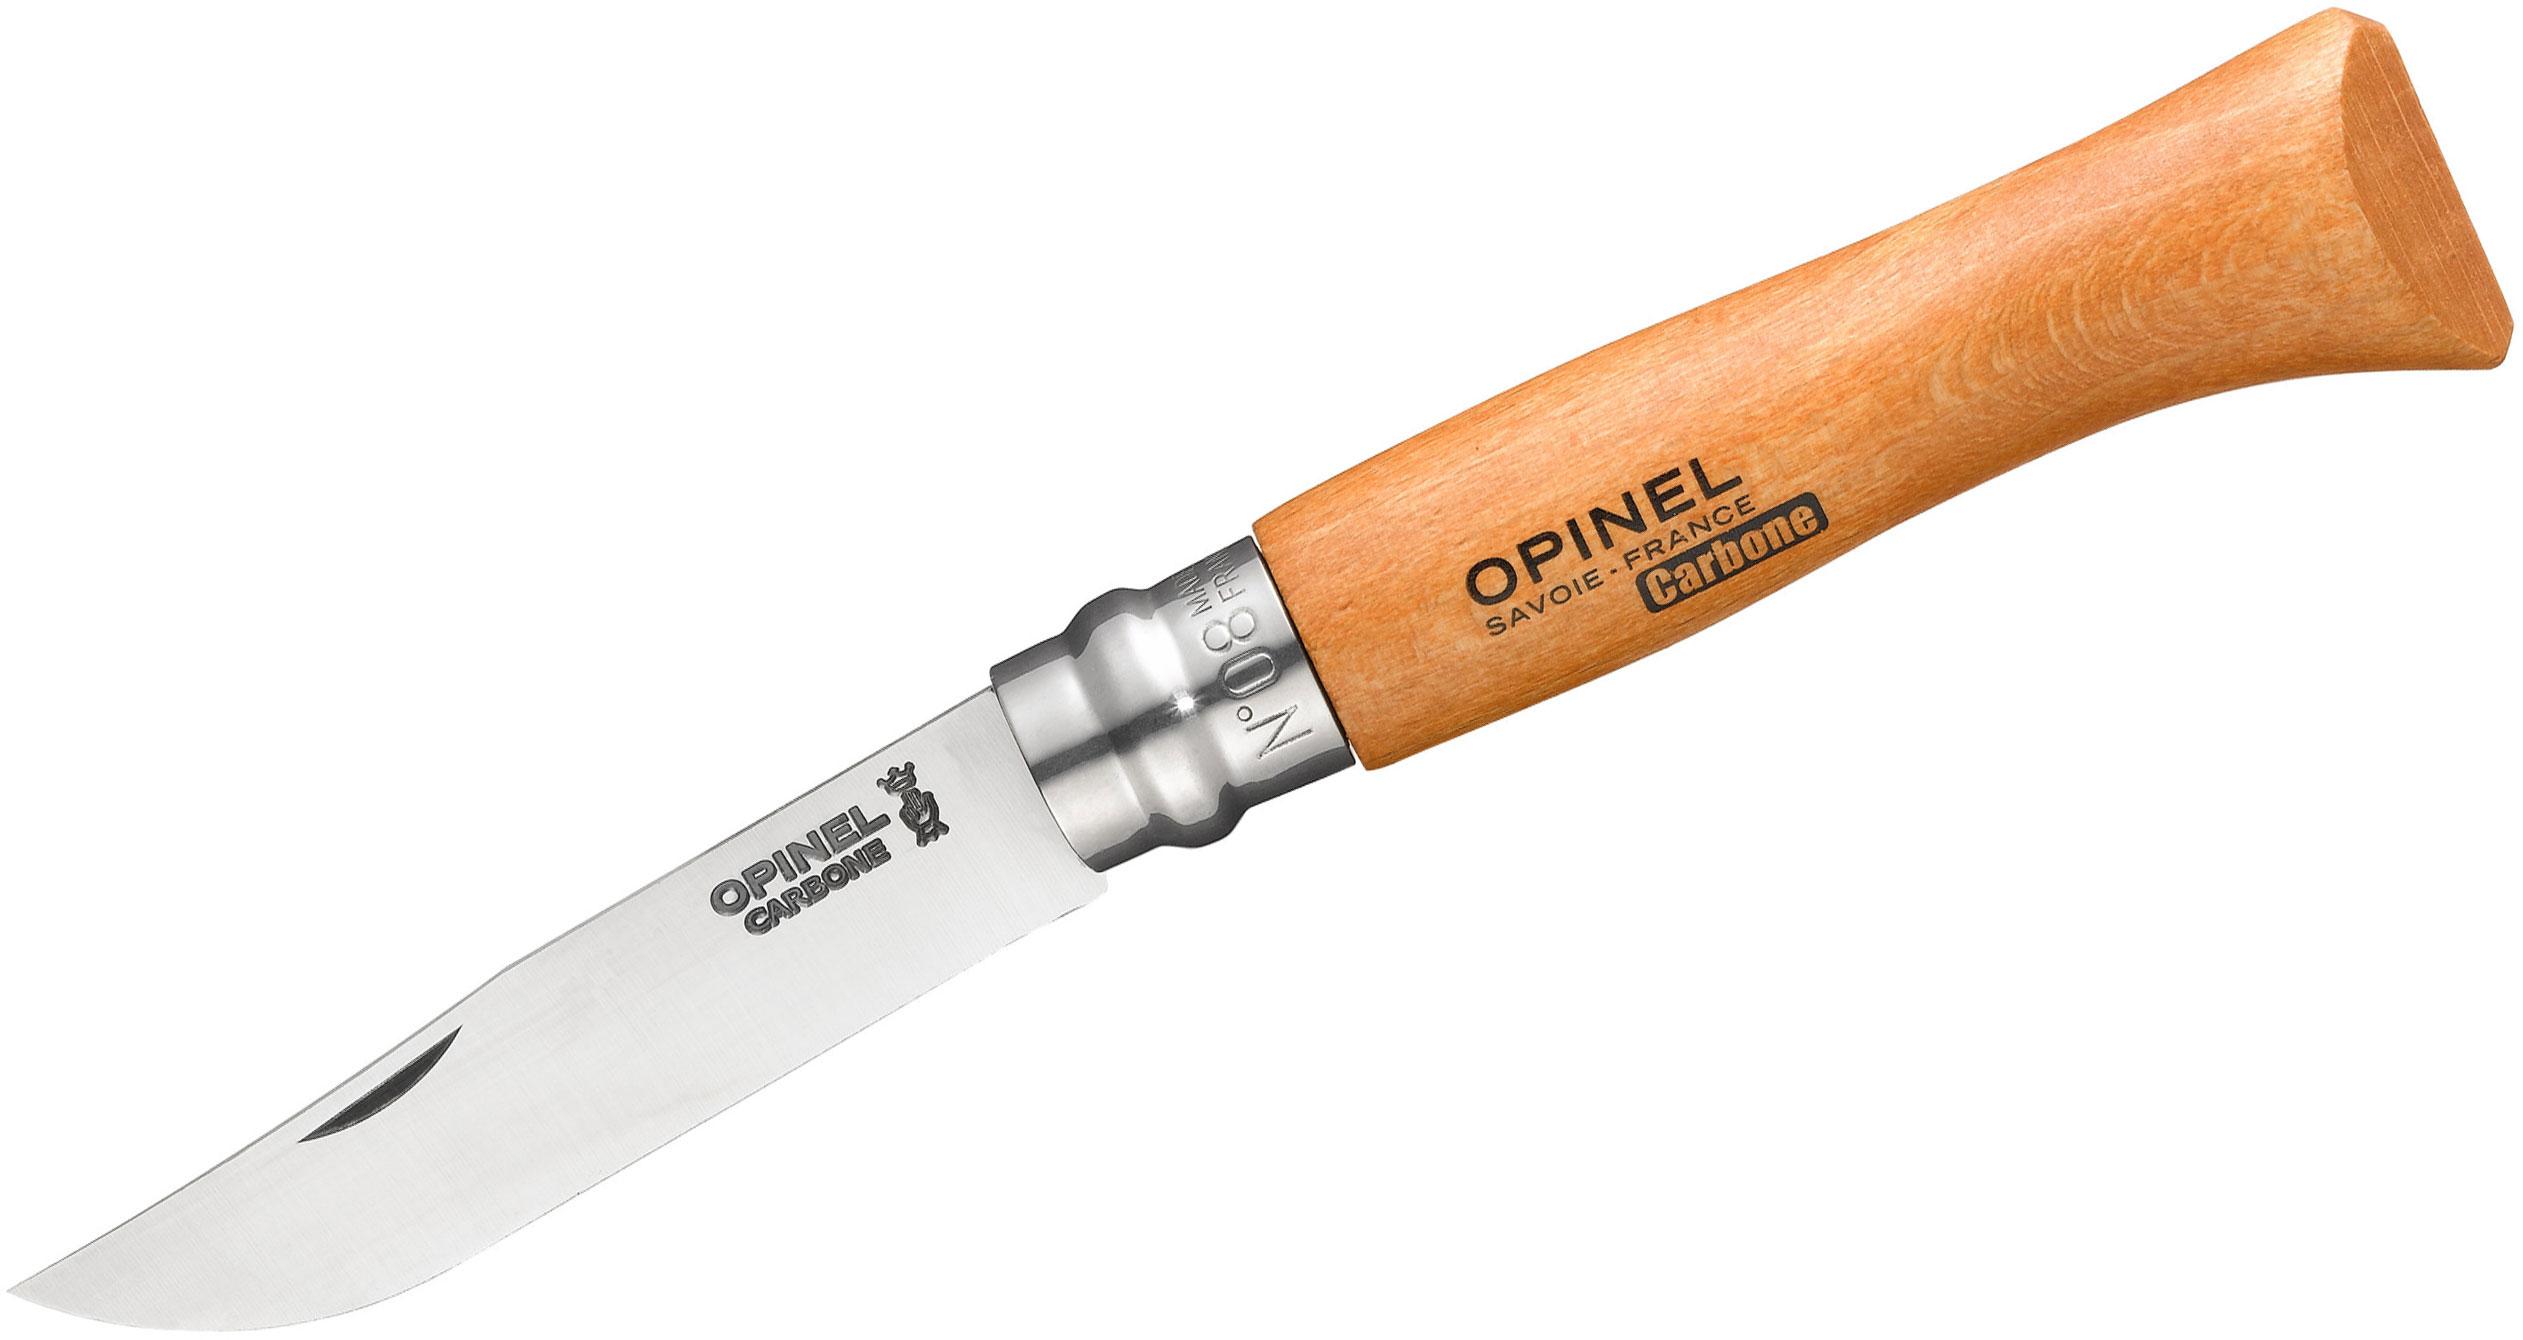 Opinel N08 Folding Knife 3.25 inch X90 Carbon Plain Blade, Beechwood Handle